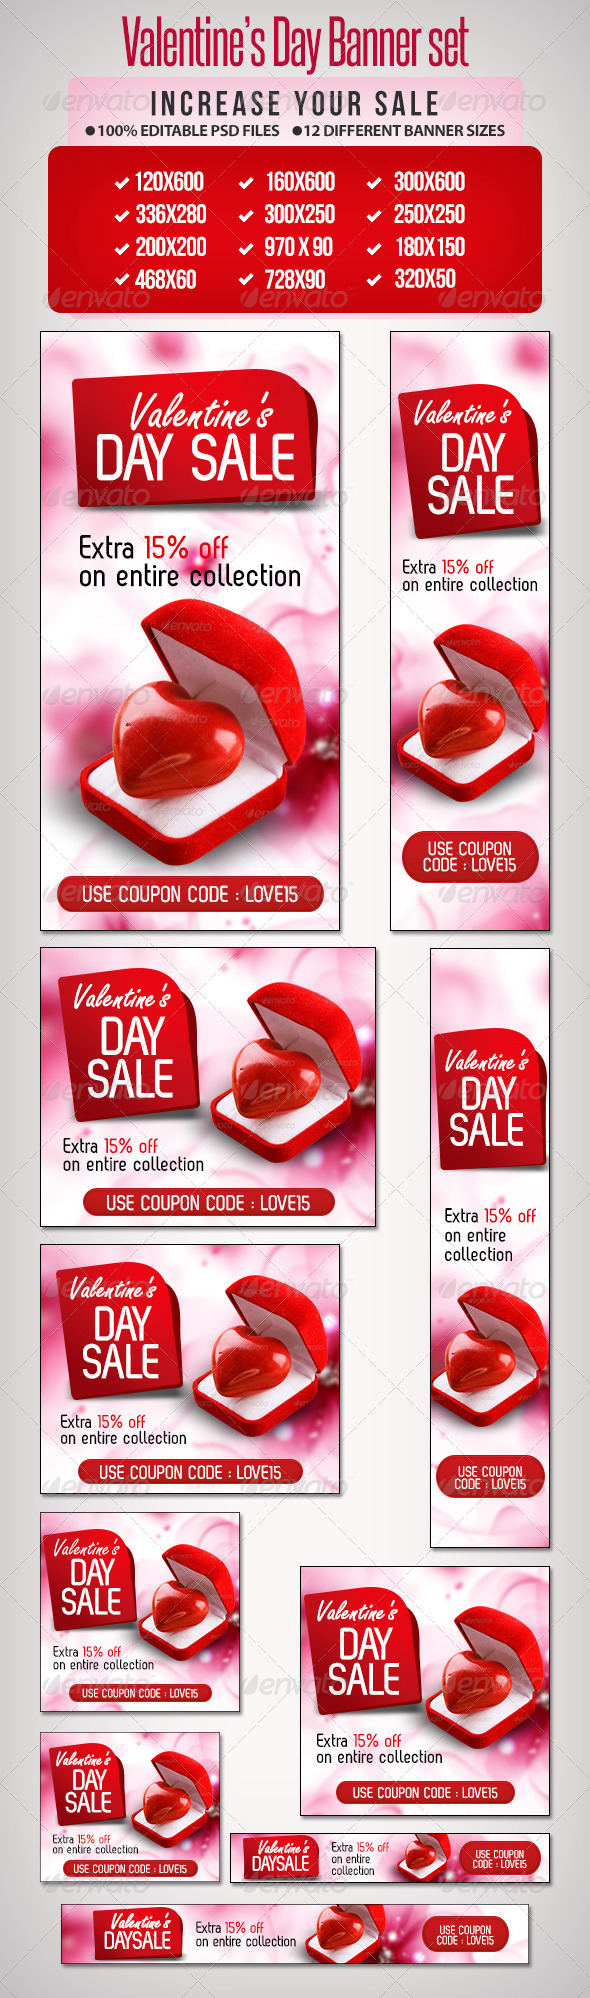 GraphicRiver Valentine s Day Banner Set 5 6607426